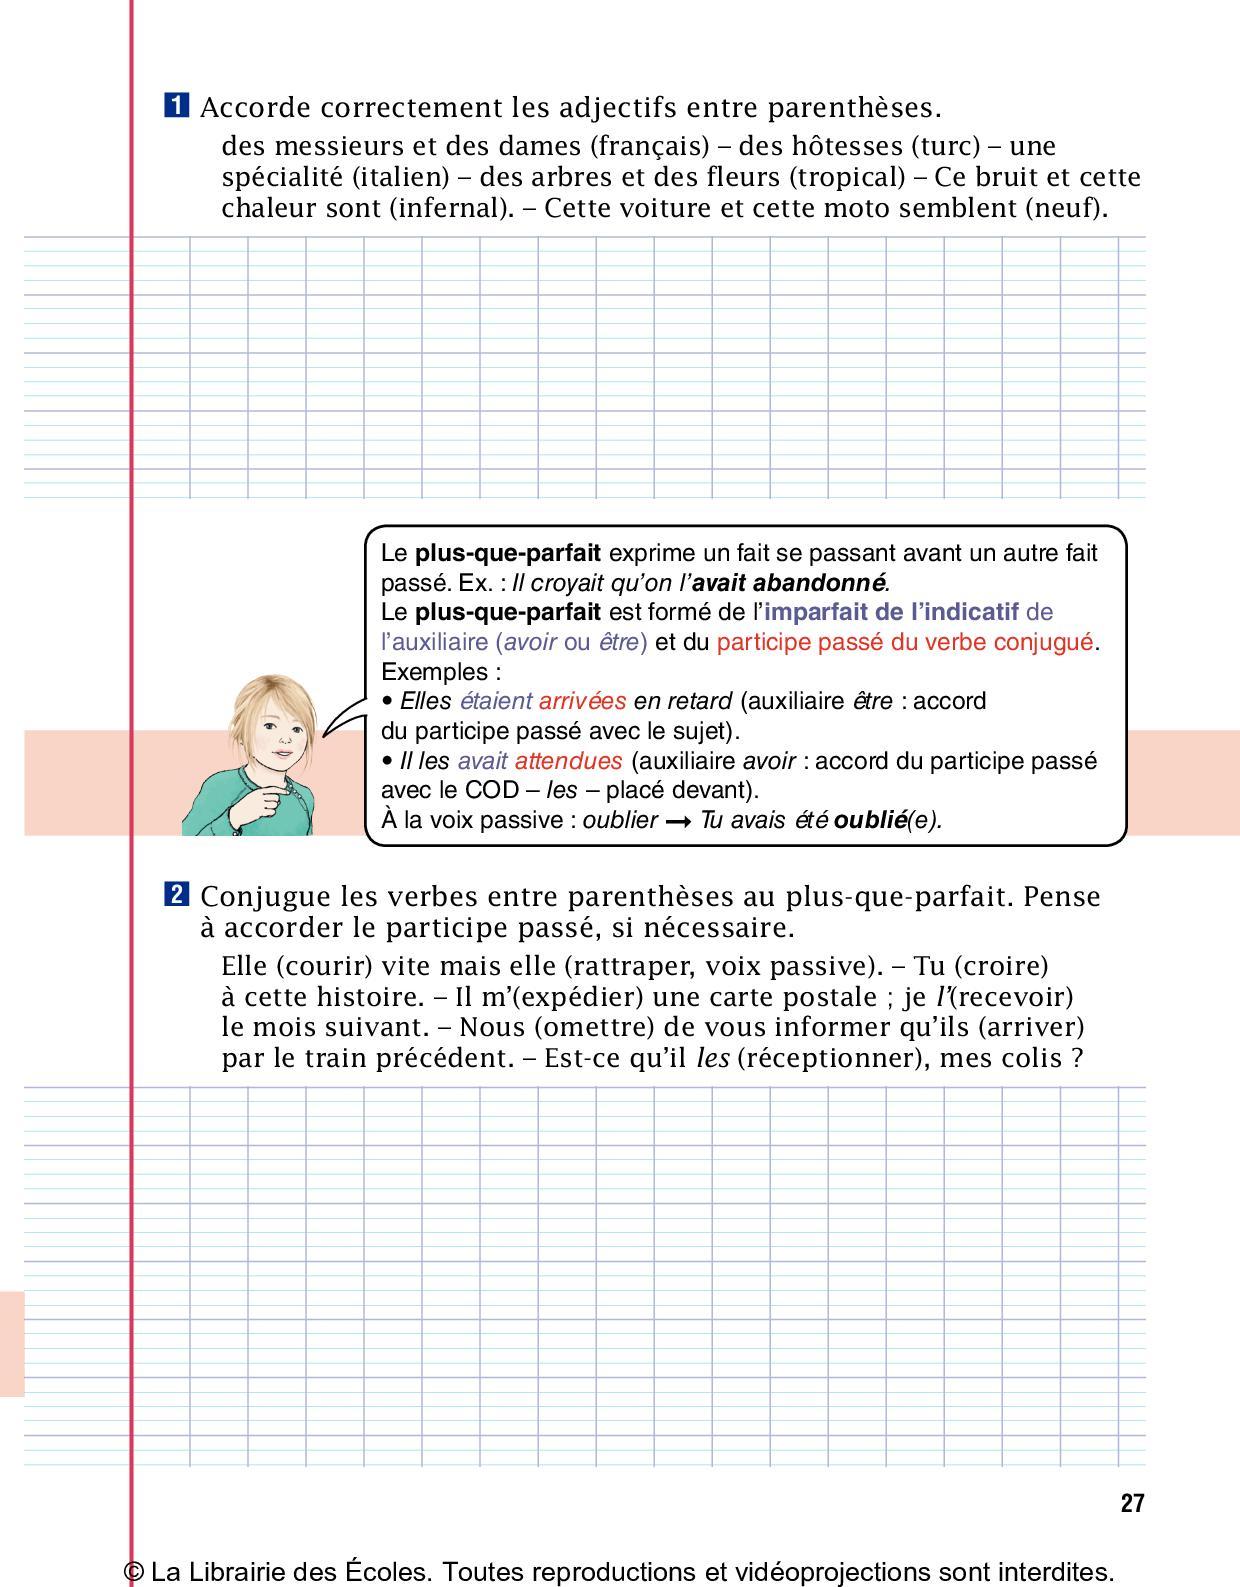 Les Petits Devoirs Dictees Cm2 Calameo Downloader